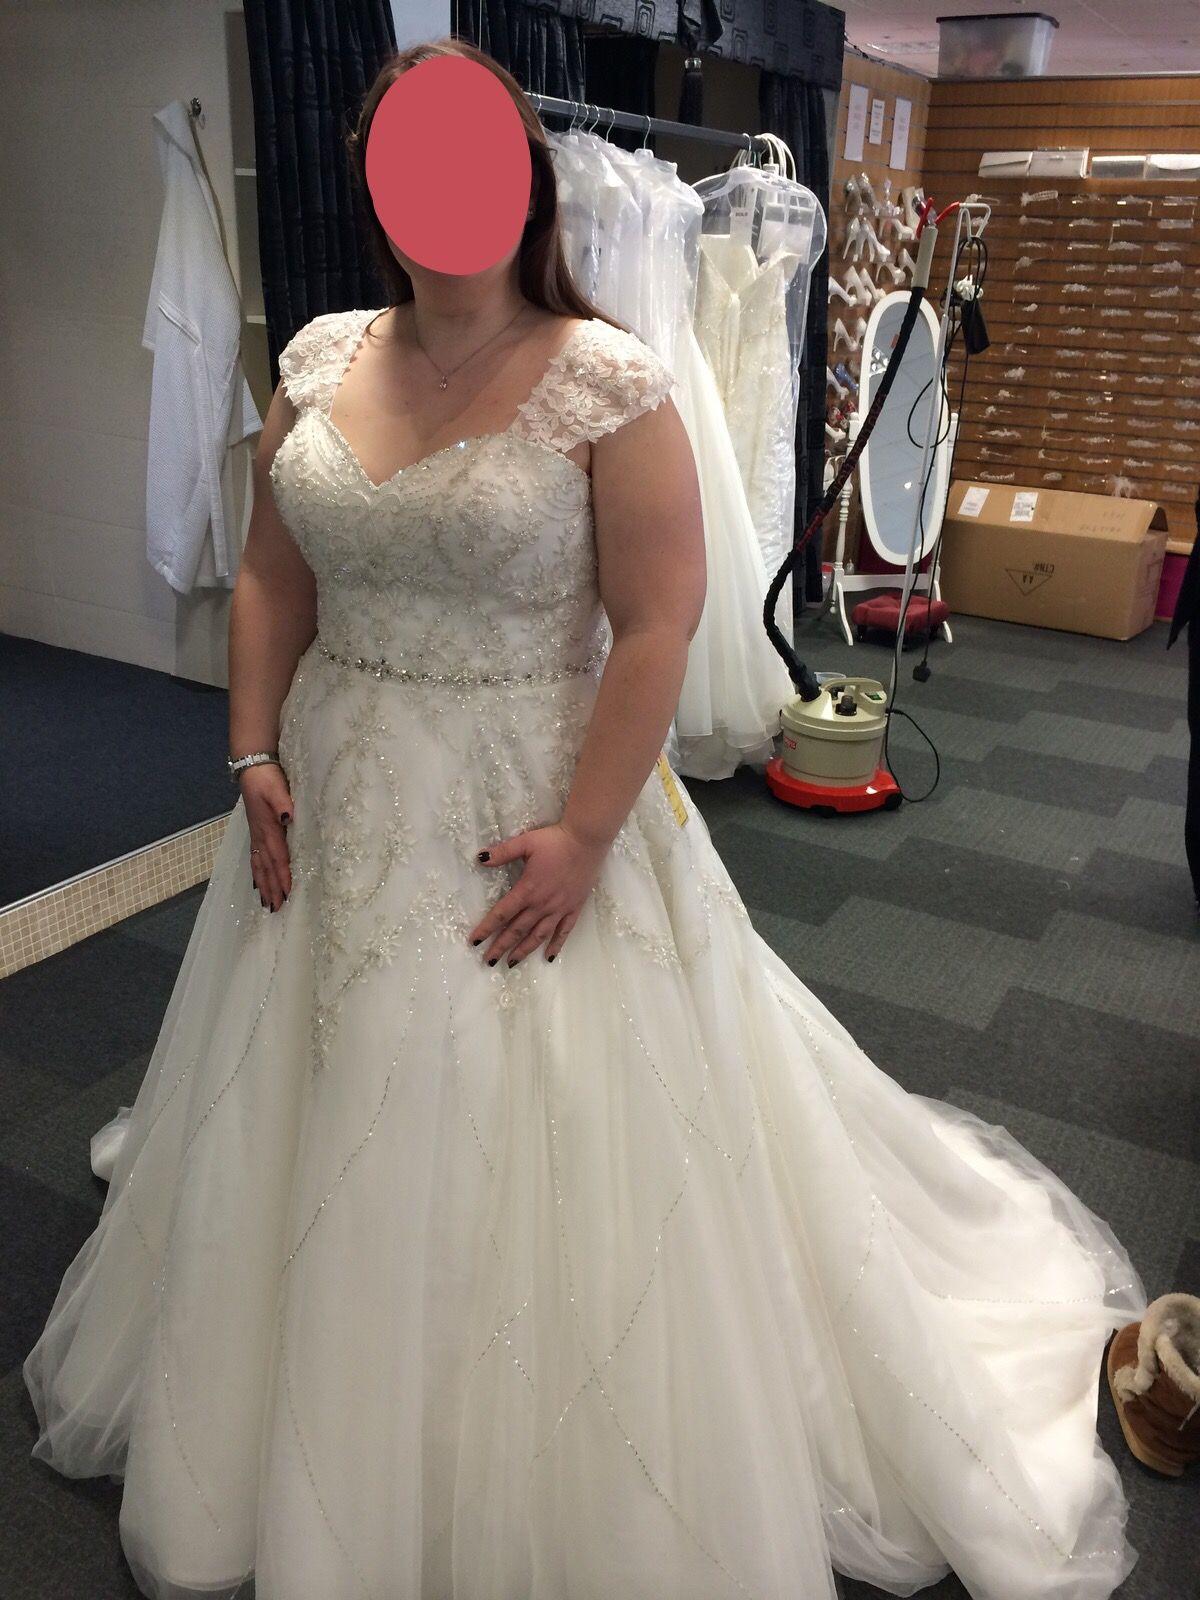 Alfred Angelo Tiana Style 246 Brides Weddingbee Bride Wedding Dresses Bridal Preparation [ 1600 x 1200 Pixel ]